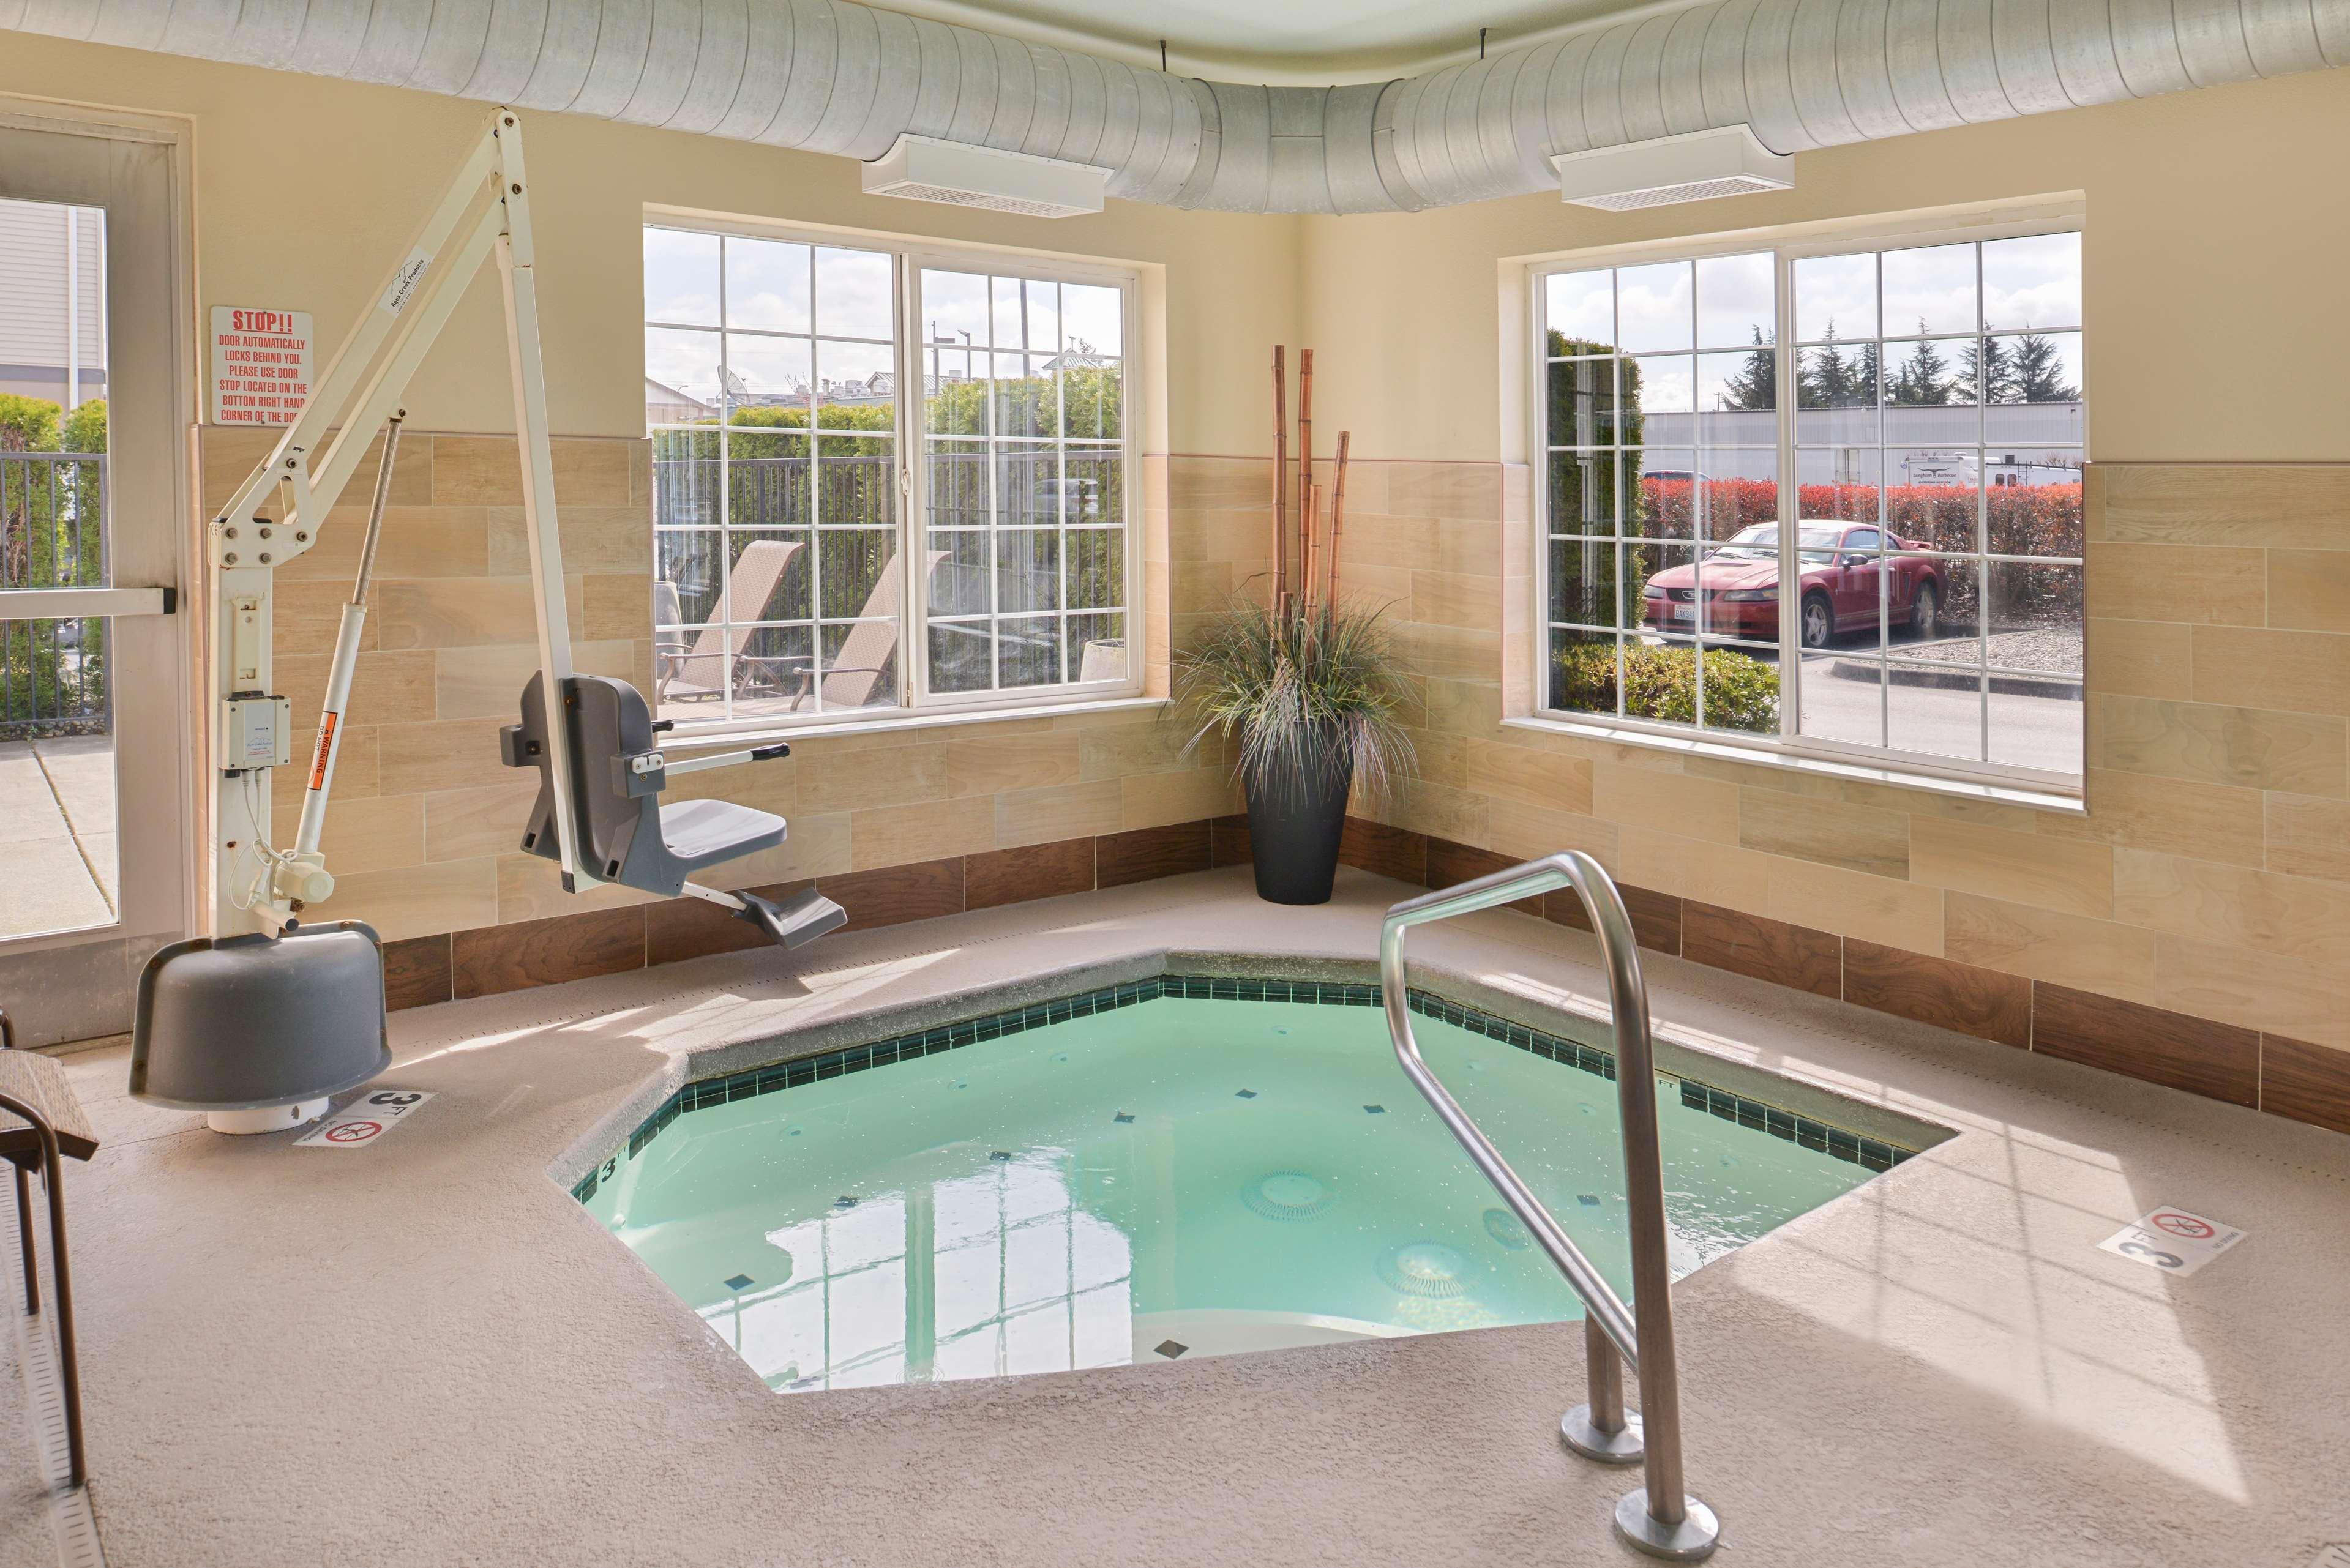 Best Western Plus Mountain View Auburn Inn image 47